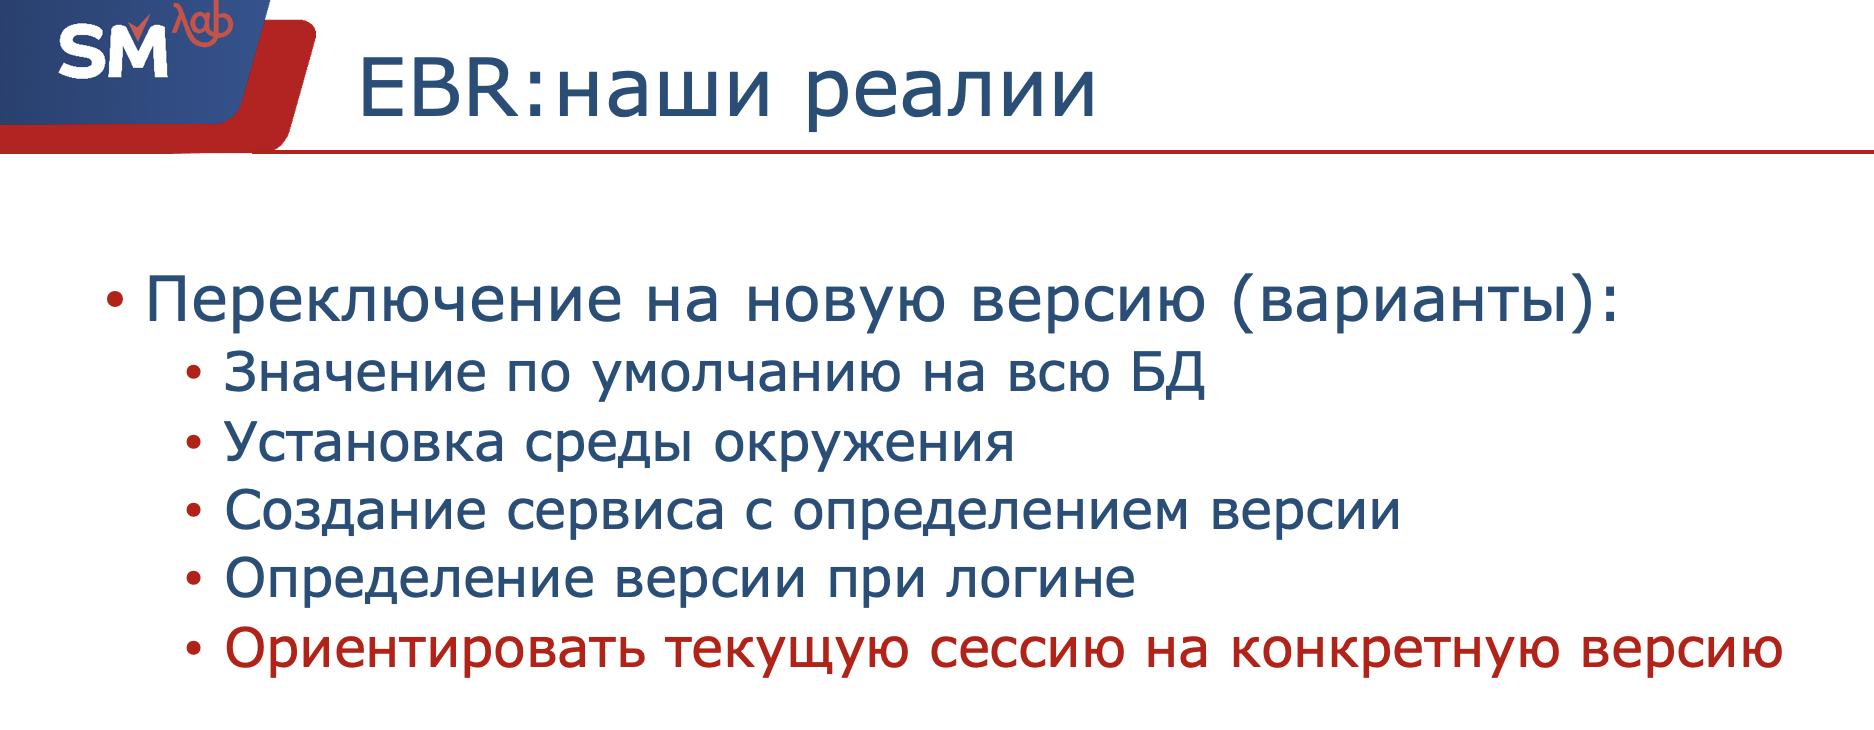 Edition-Based Redefinition. Часть 2